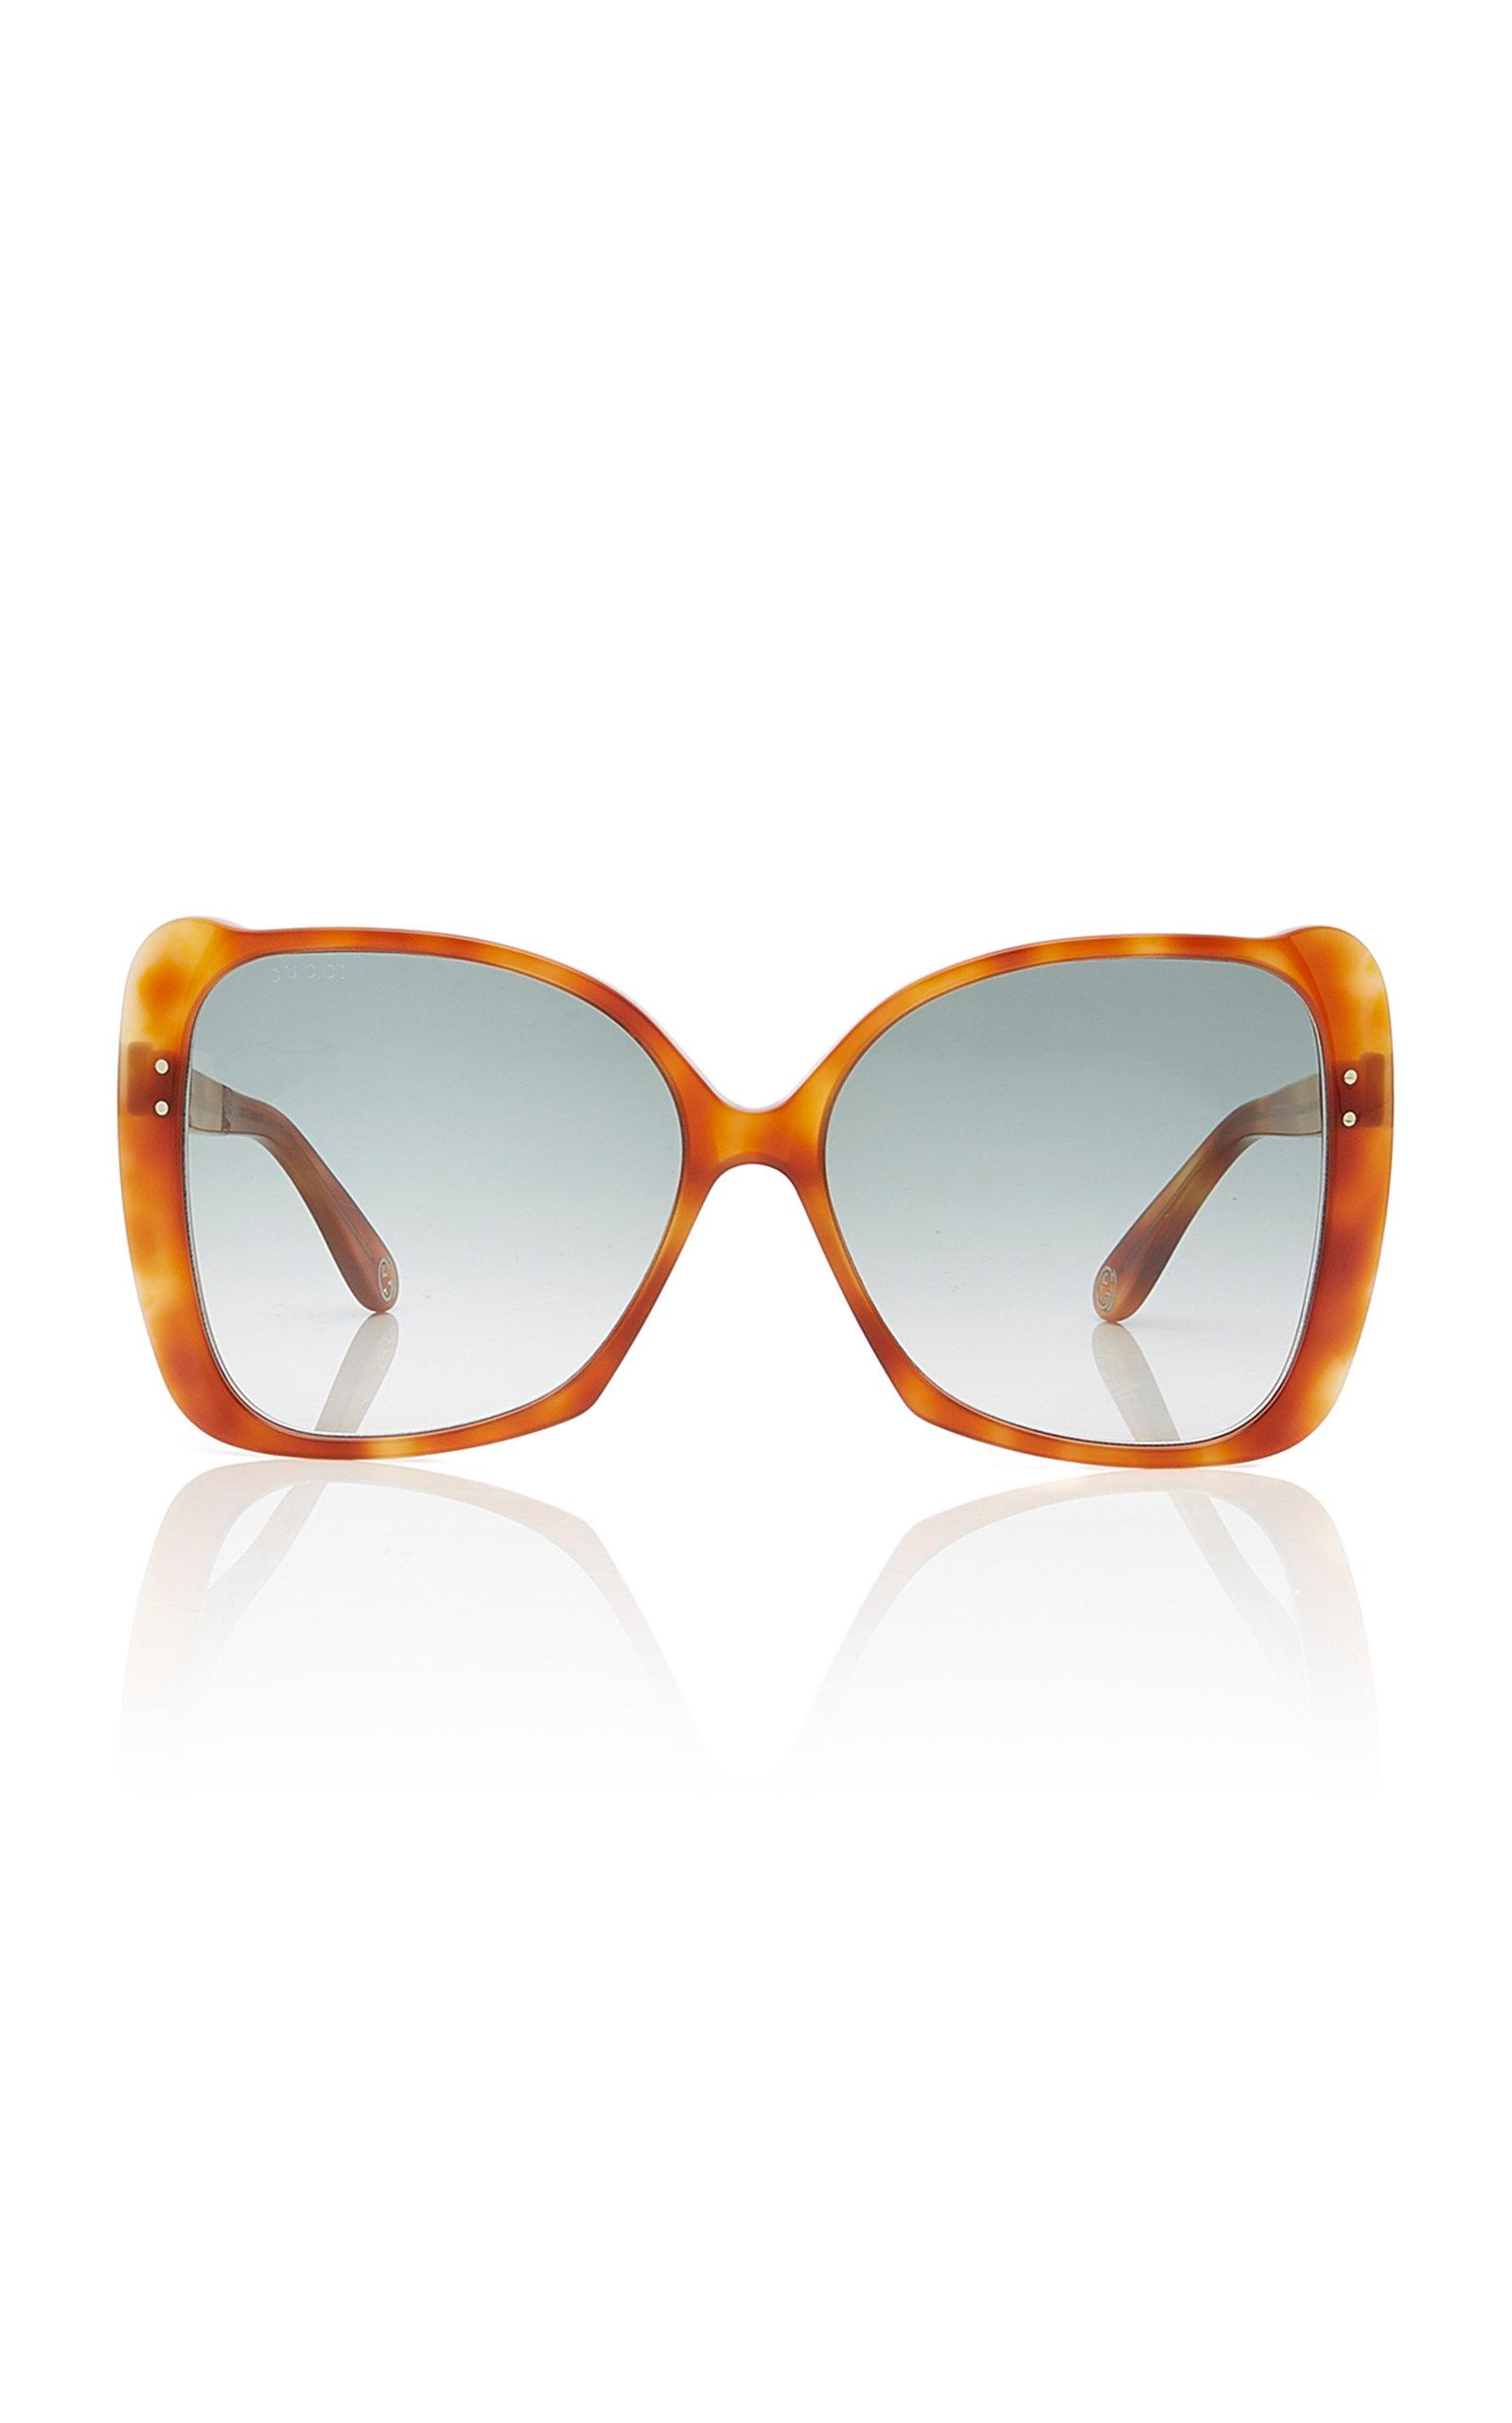 78eda9f34847 Gucci SunglassesButterfly-Frame Tortoiseshell Acetate Sunglasses. CLOSE.  Loading